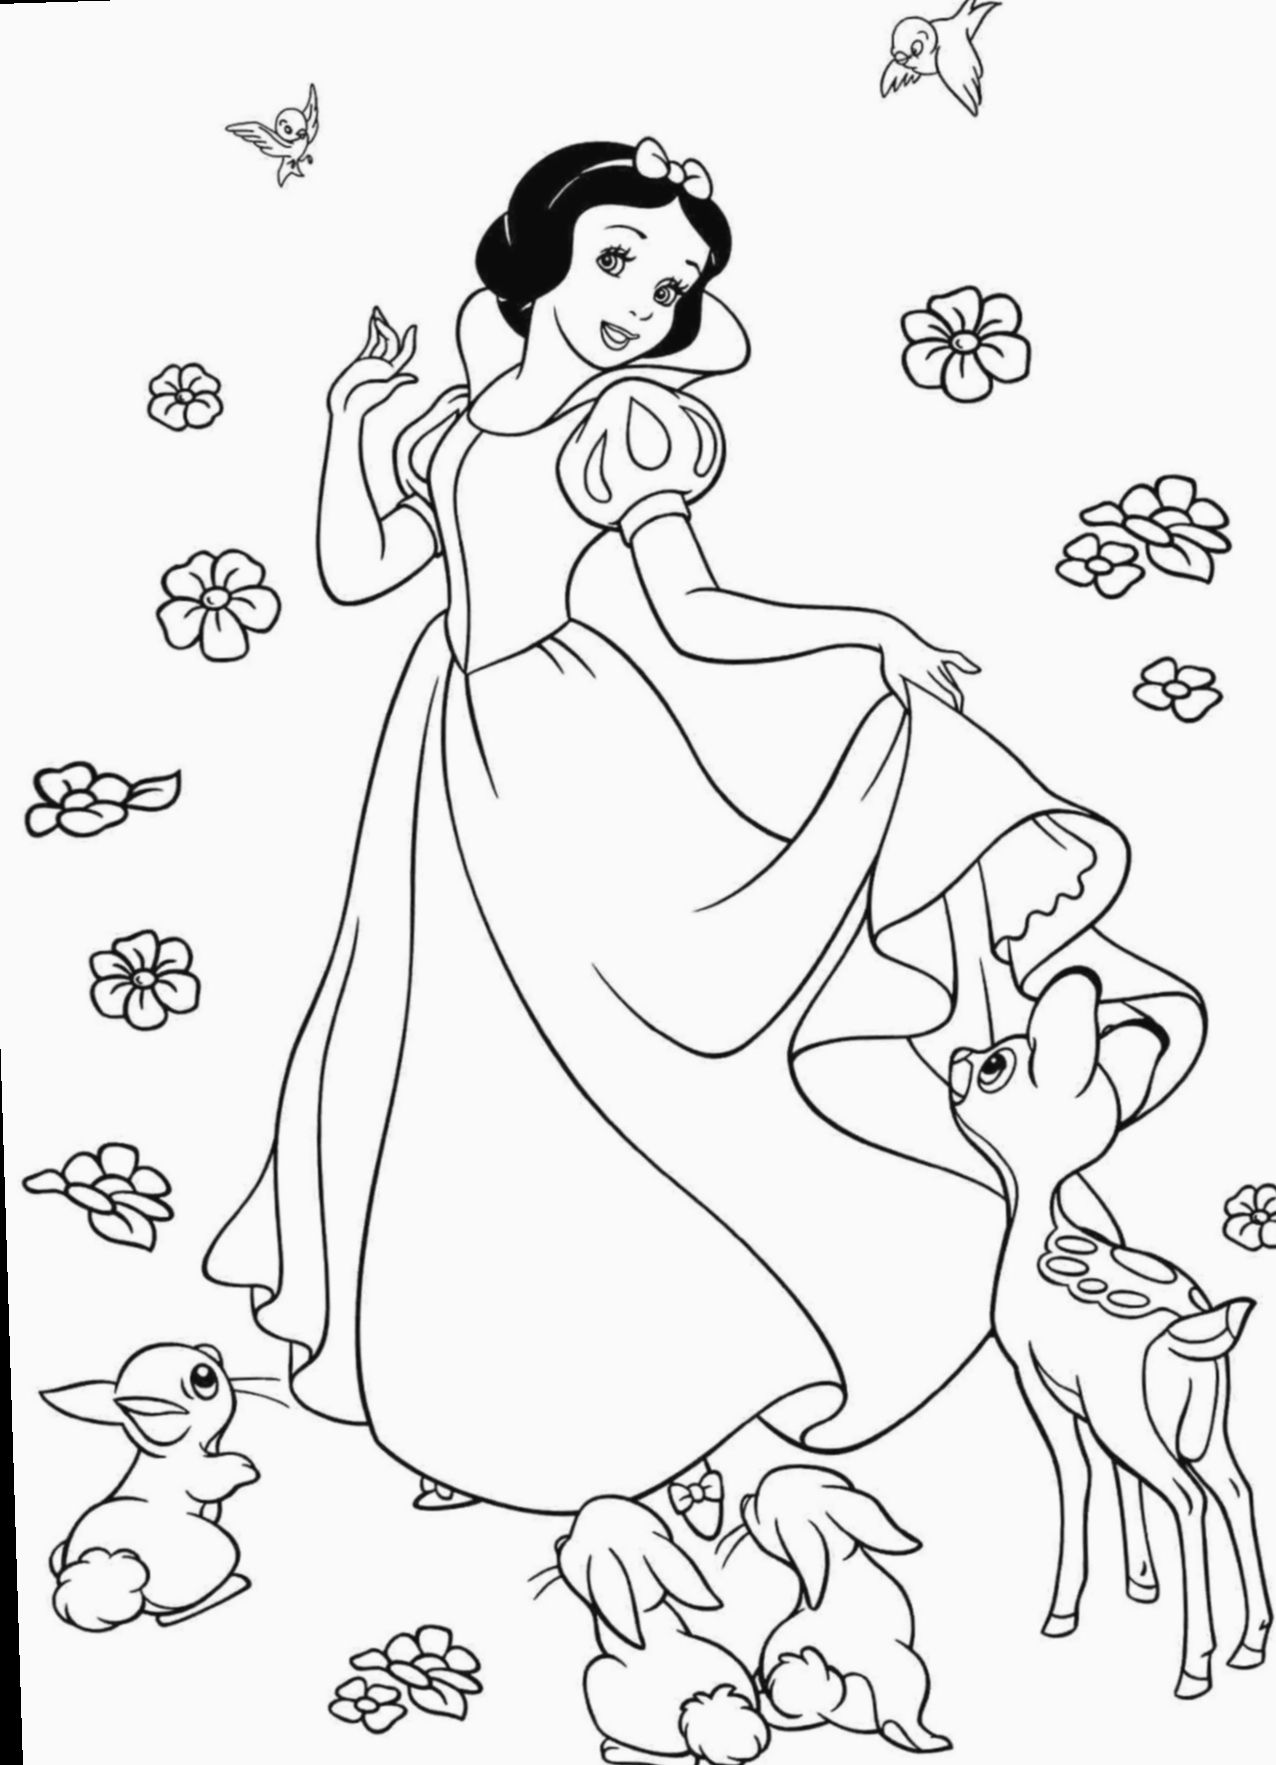 13 Drawing Disney Princesses Snow White Gratis Kleurplaten Disney Kleurplaten Sneeuwwitje